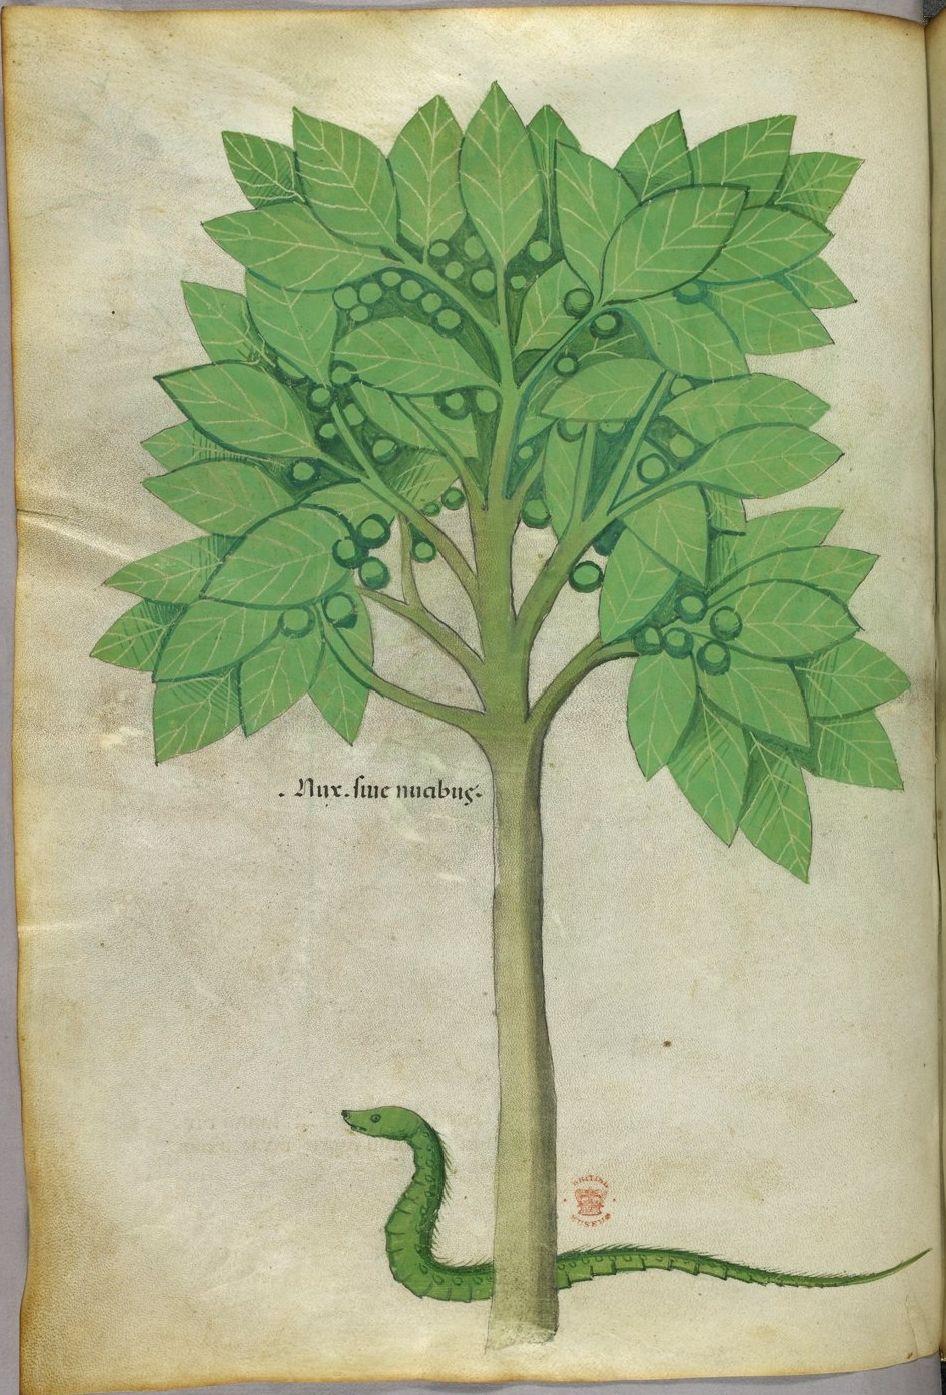 :: Codex Sloane 4016 is a 15th century Italian parchment manuscript ::